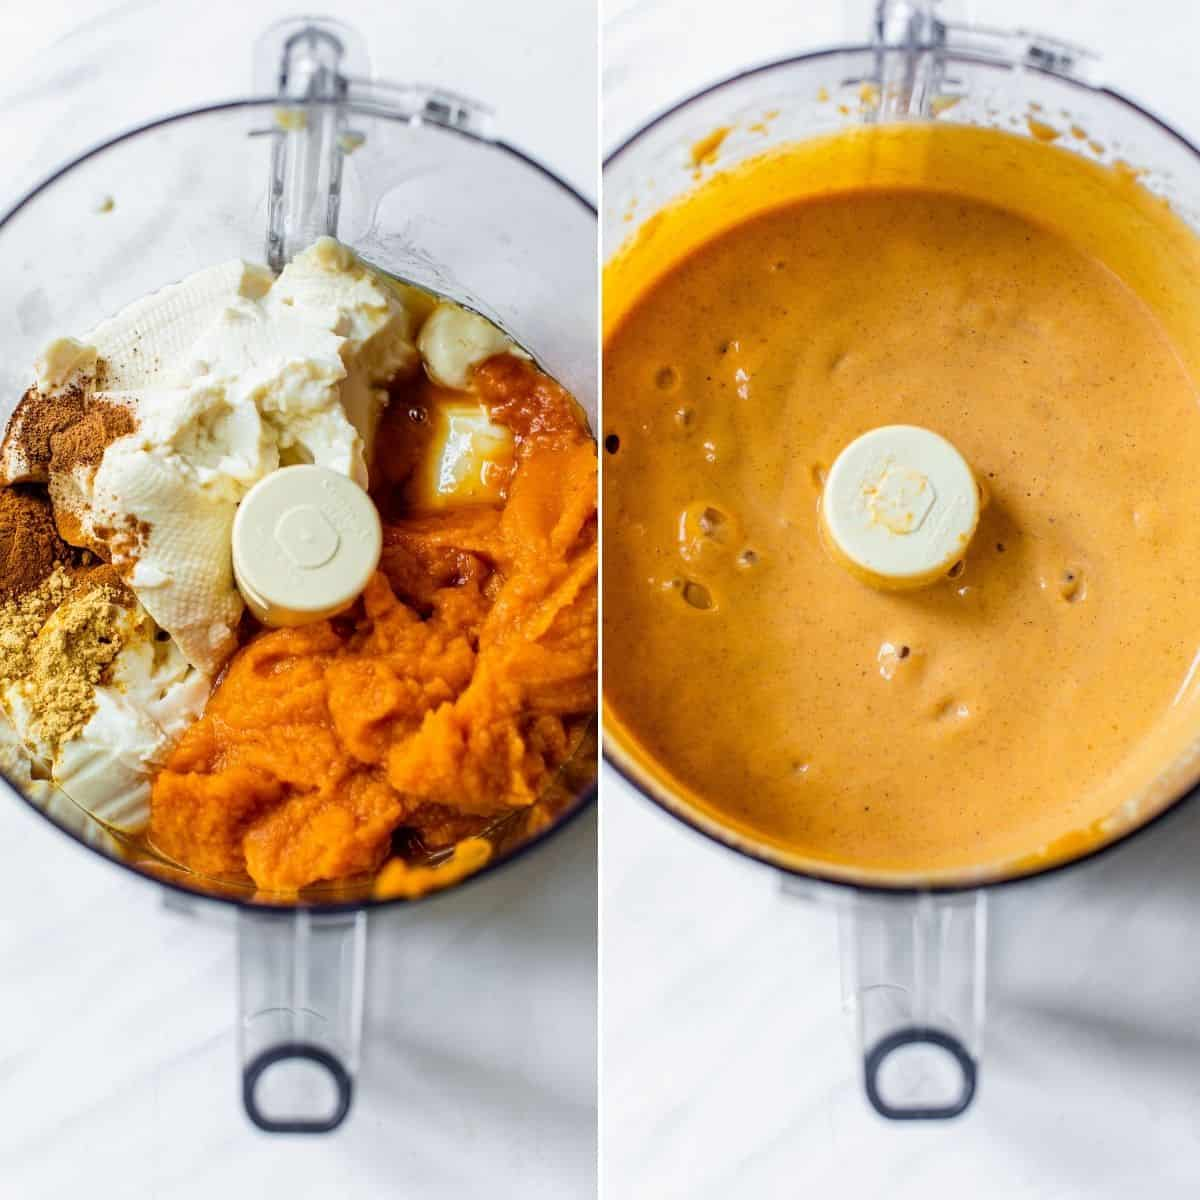 making pumpkin mousse in a food processor